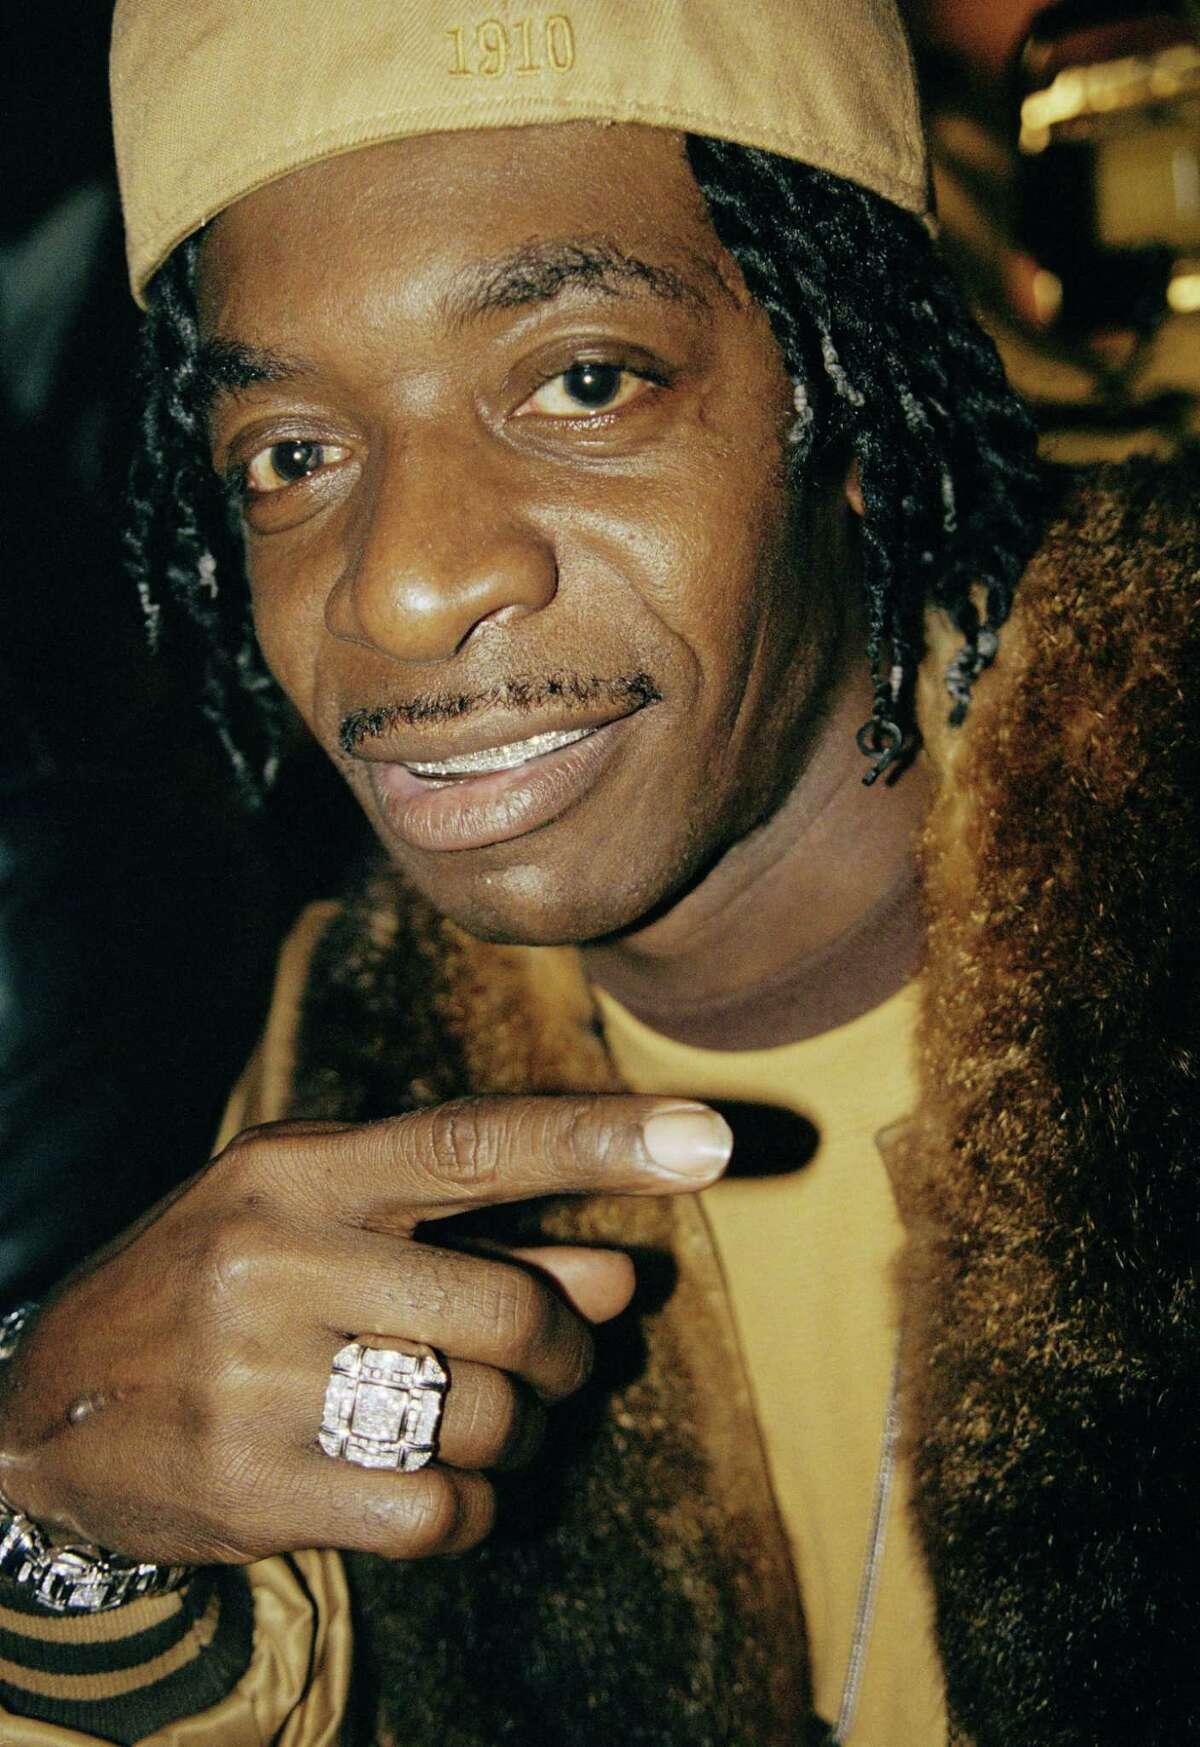 Houston hip-hop personality Darrell Veal aka Wickett Crickett. Crickett was a promoter, radio host, humanitarian and emcee.